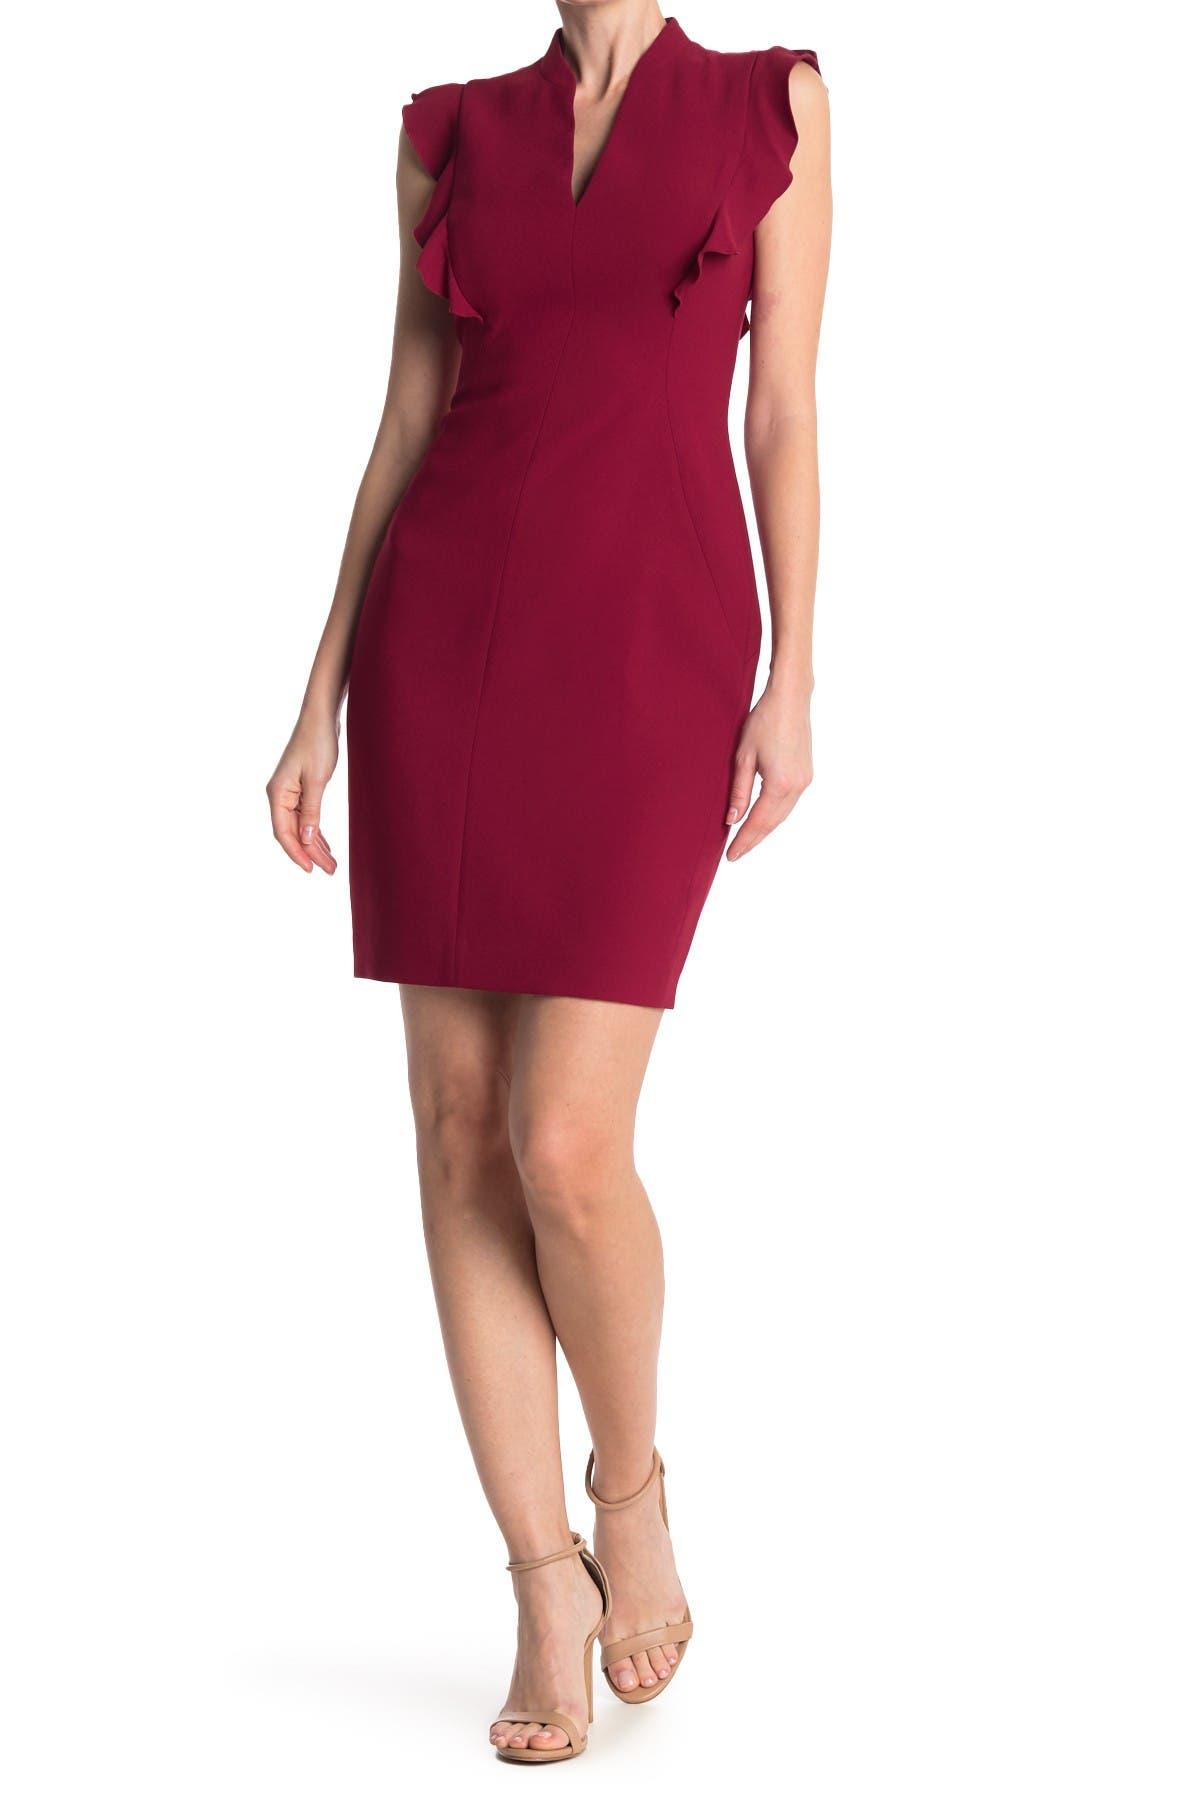 Image of Elie Tahari Gretta V-Neck Ruffle Dress